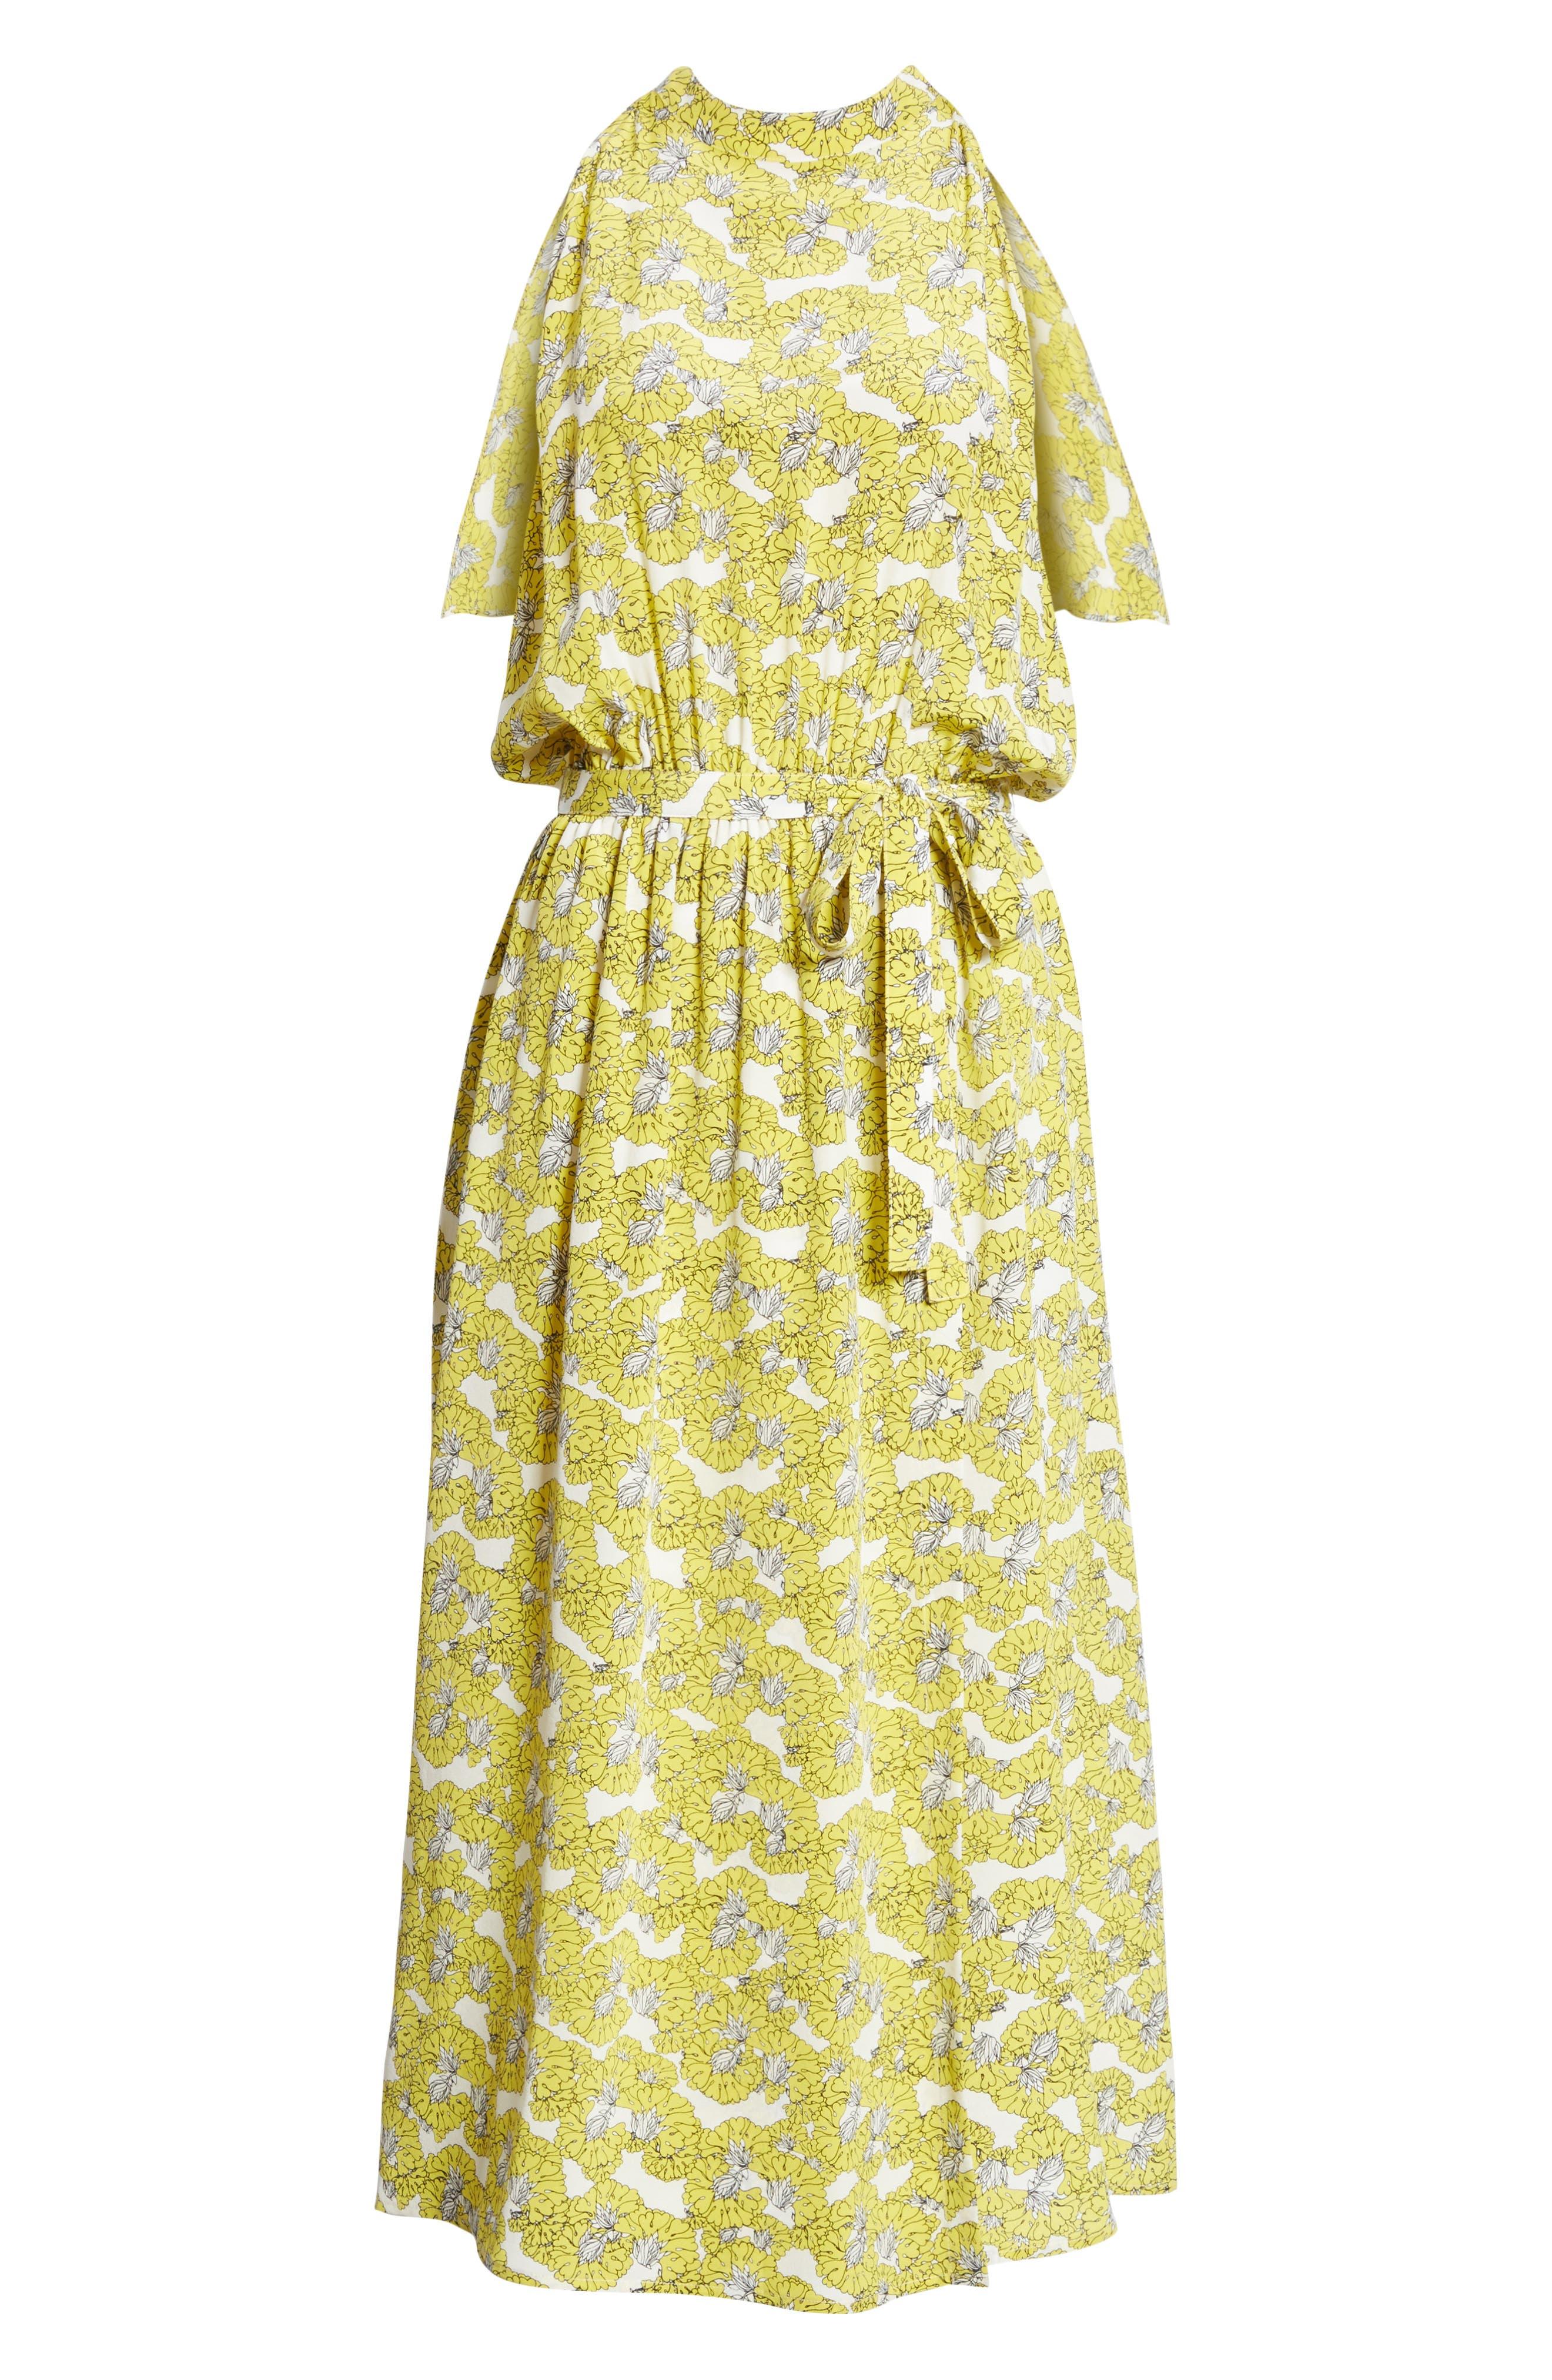 Dania Floral Print Dress,                             Alternate thumbnail 6, color,                             730